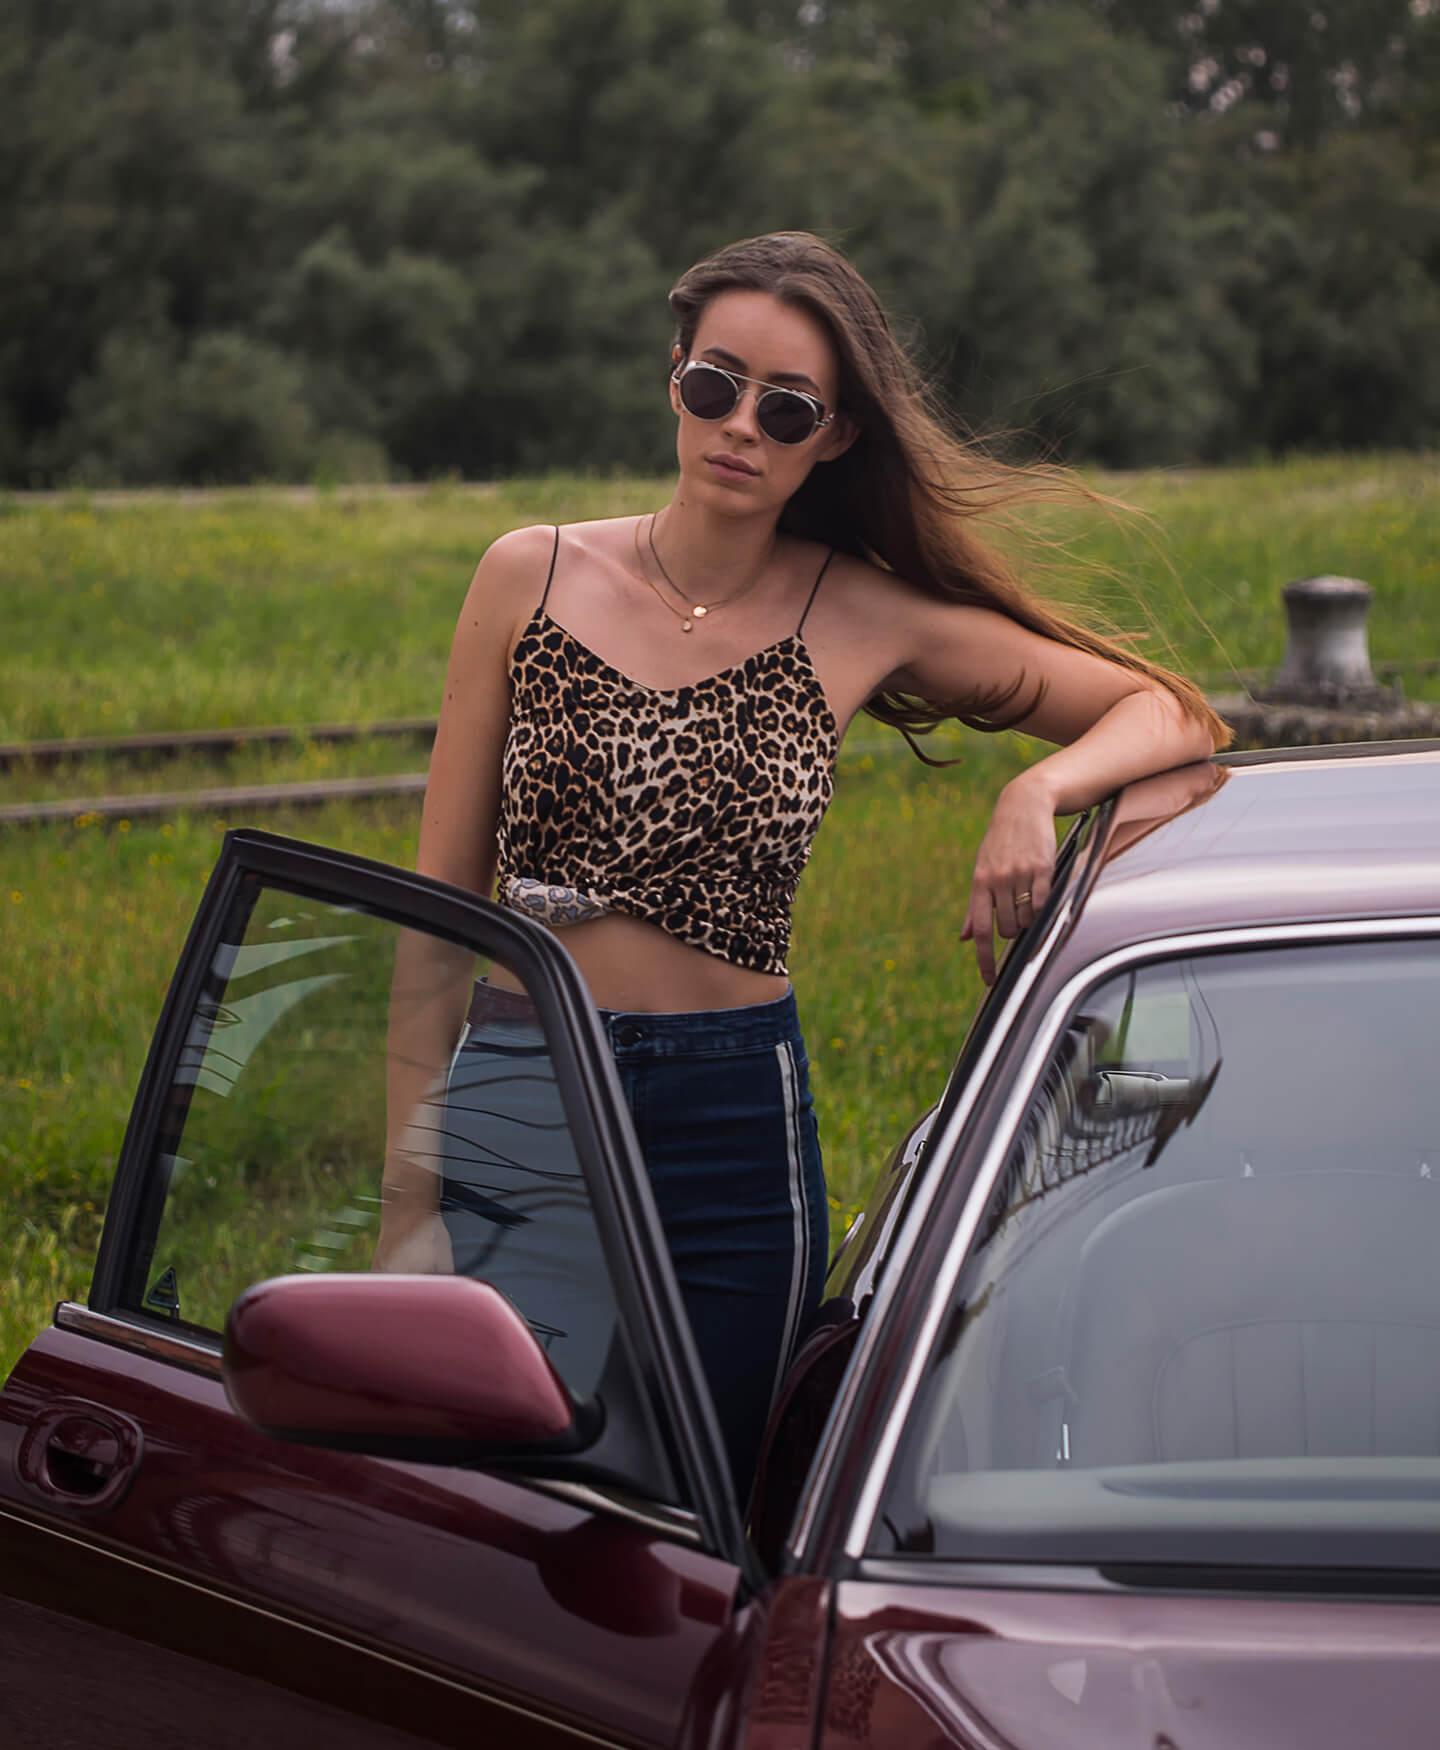 Autor-Zoran-Luketić-fotoshooting-Fotoklub-Sisak